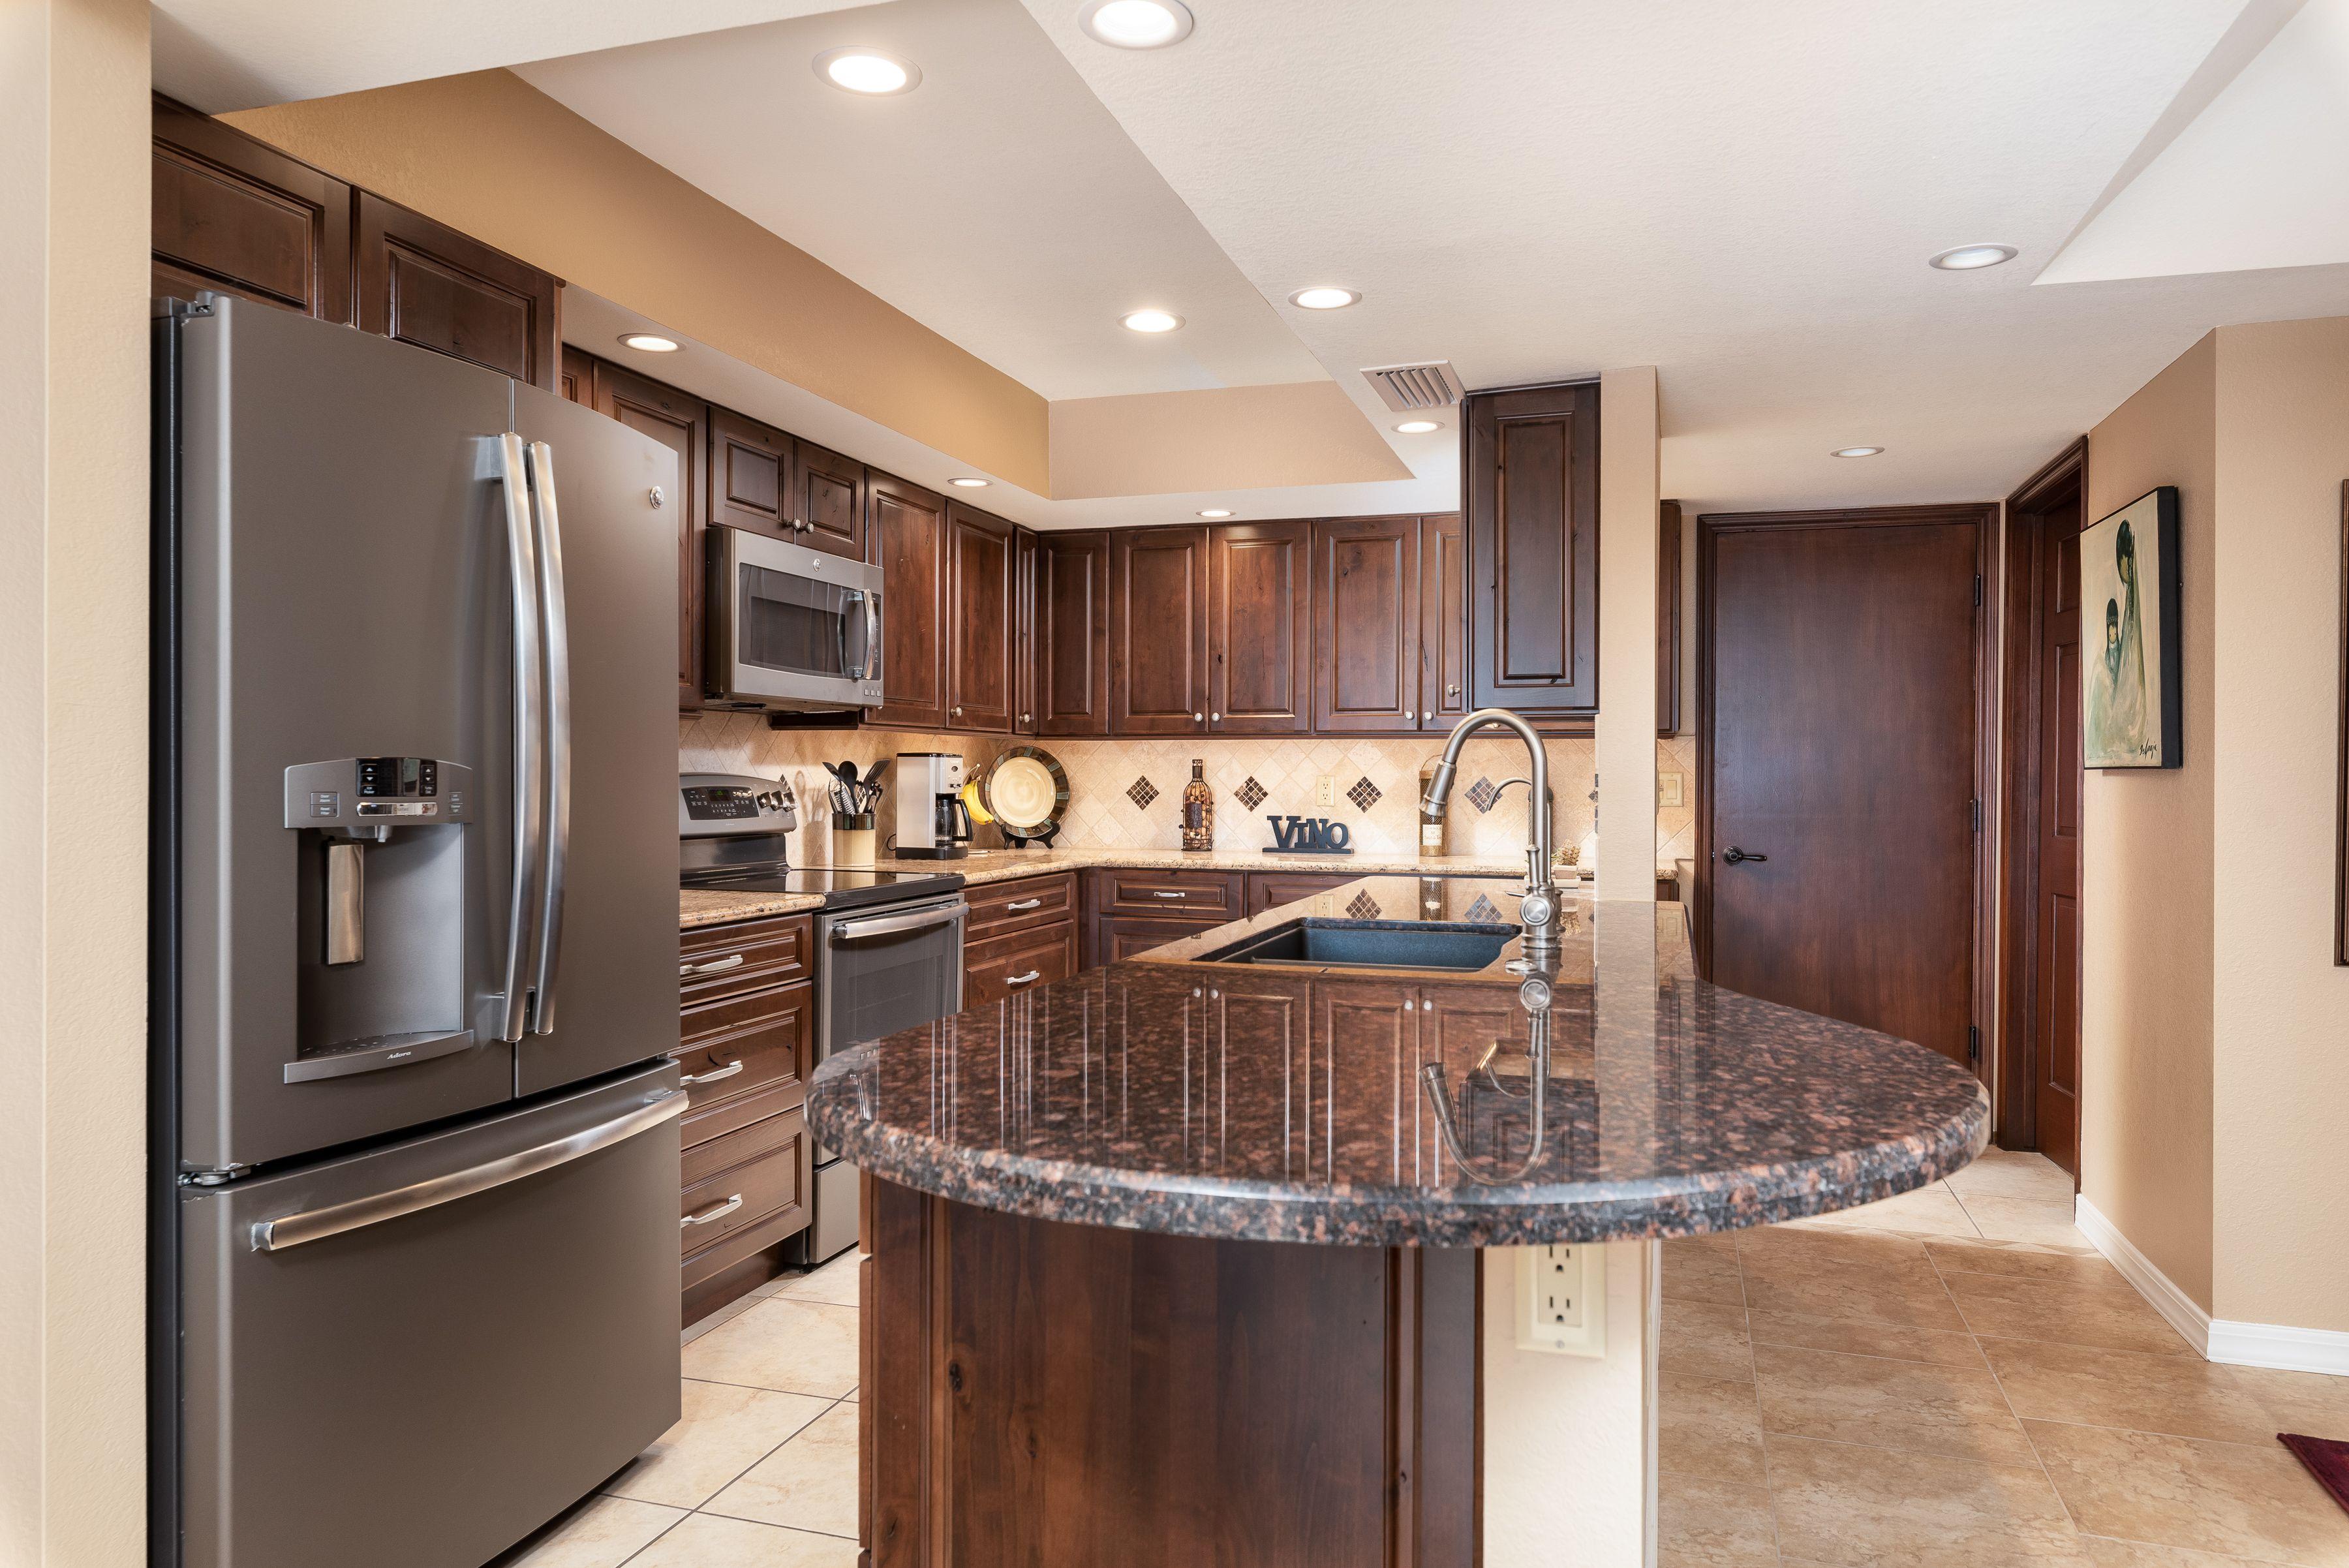 McCormick Ranch Home Remodel | Scottsdale, Arizona